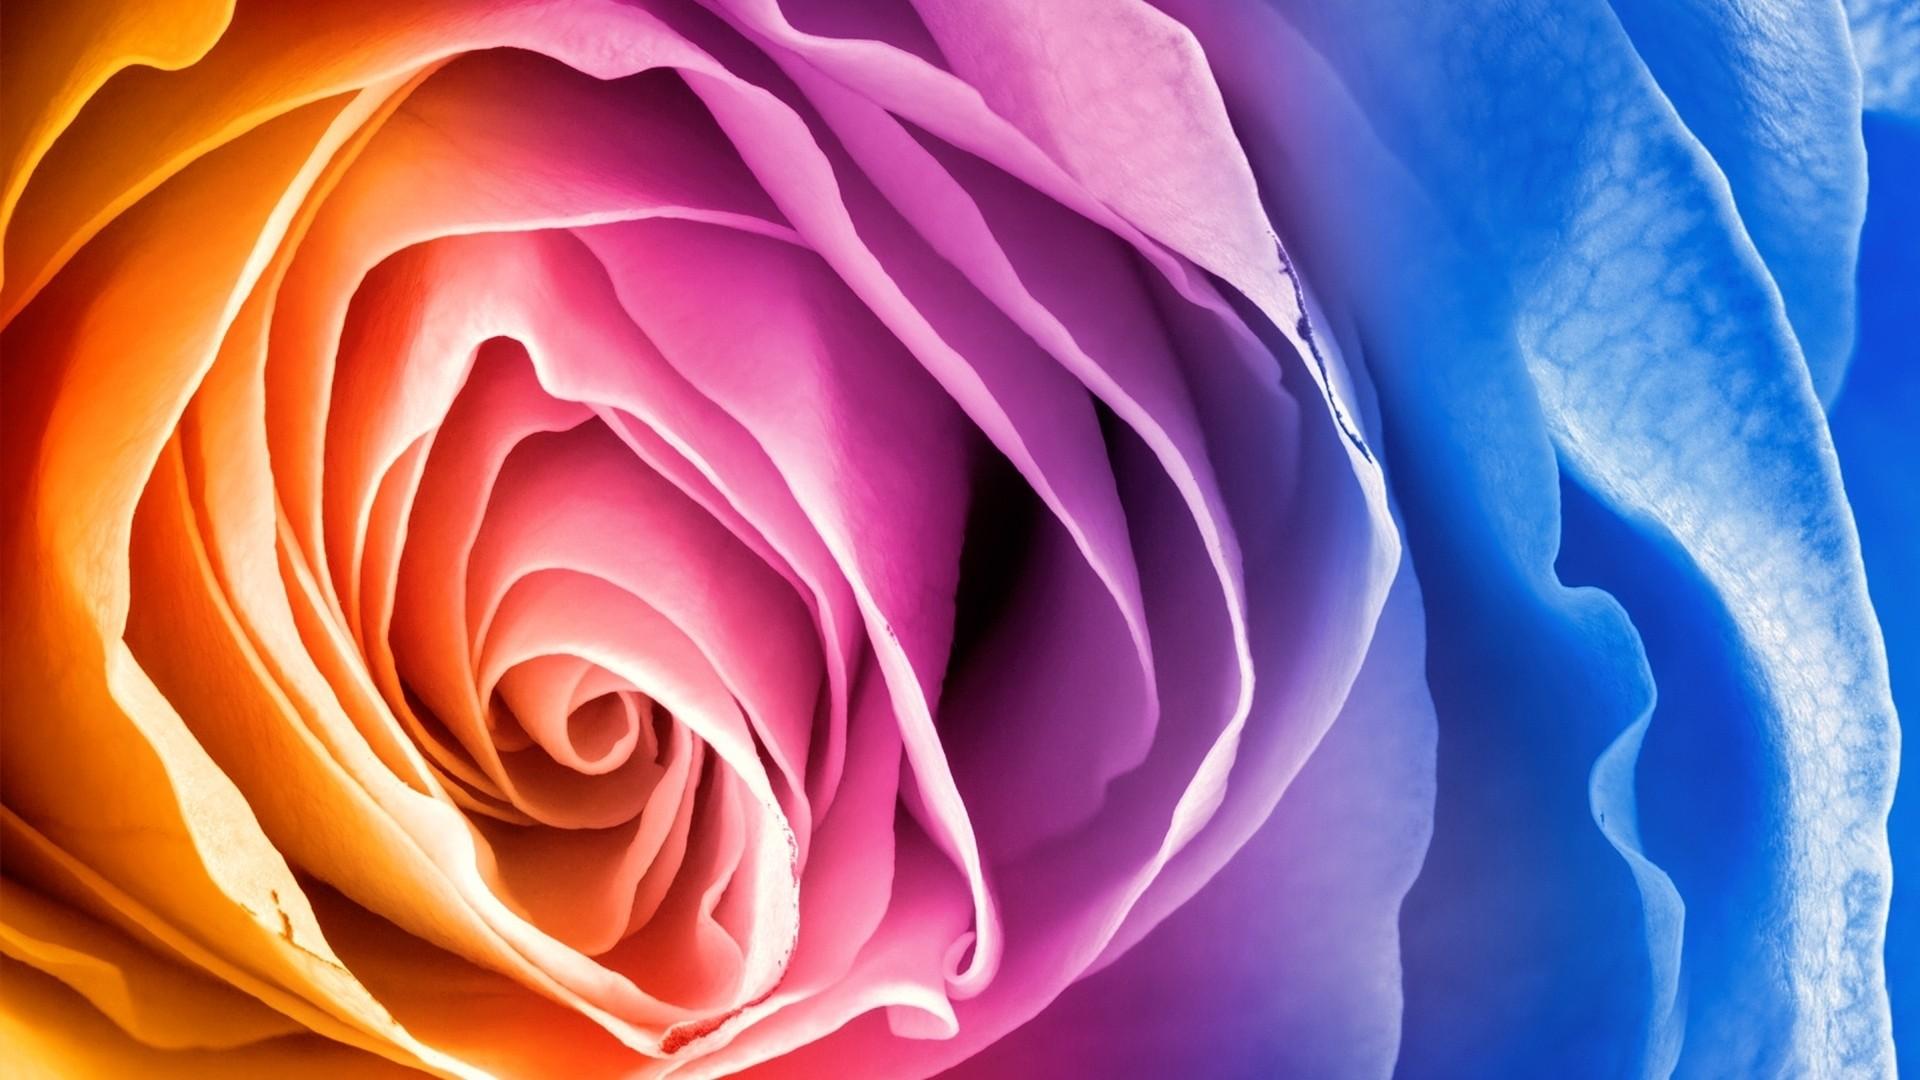 Rainbow Rose Desktop Wallpaper